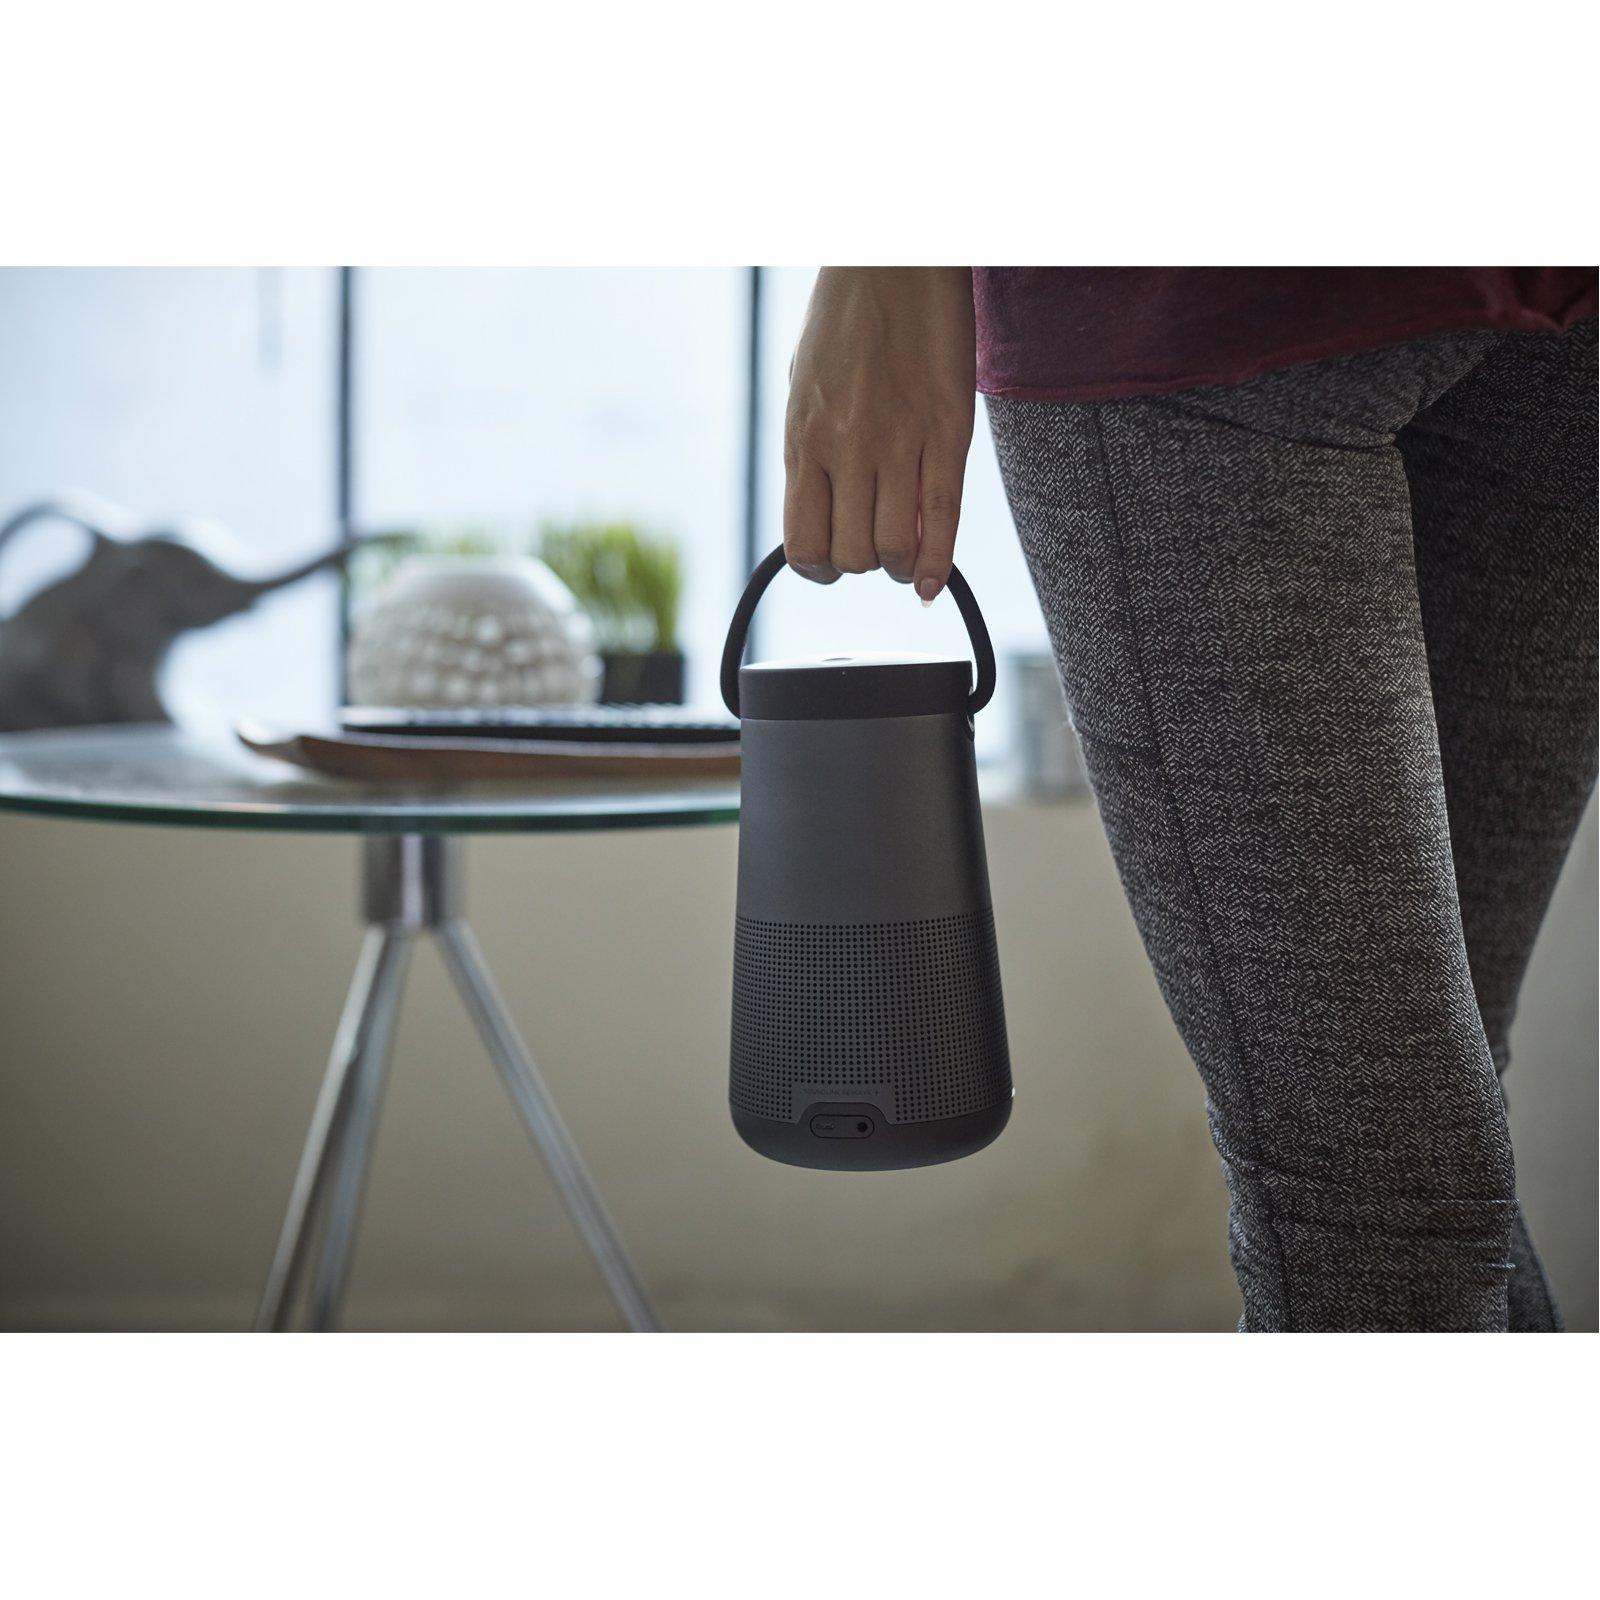 Bose SoundLink Revolve+ Portable & Long-Lasting Bluetooth 360 Speaker - Triple Black by Bose (Image #6)